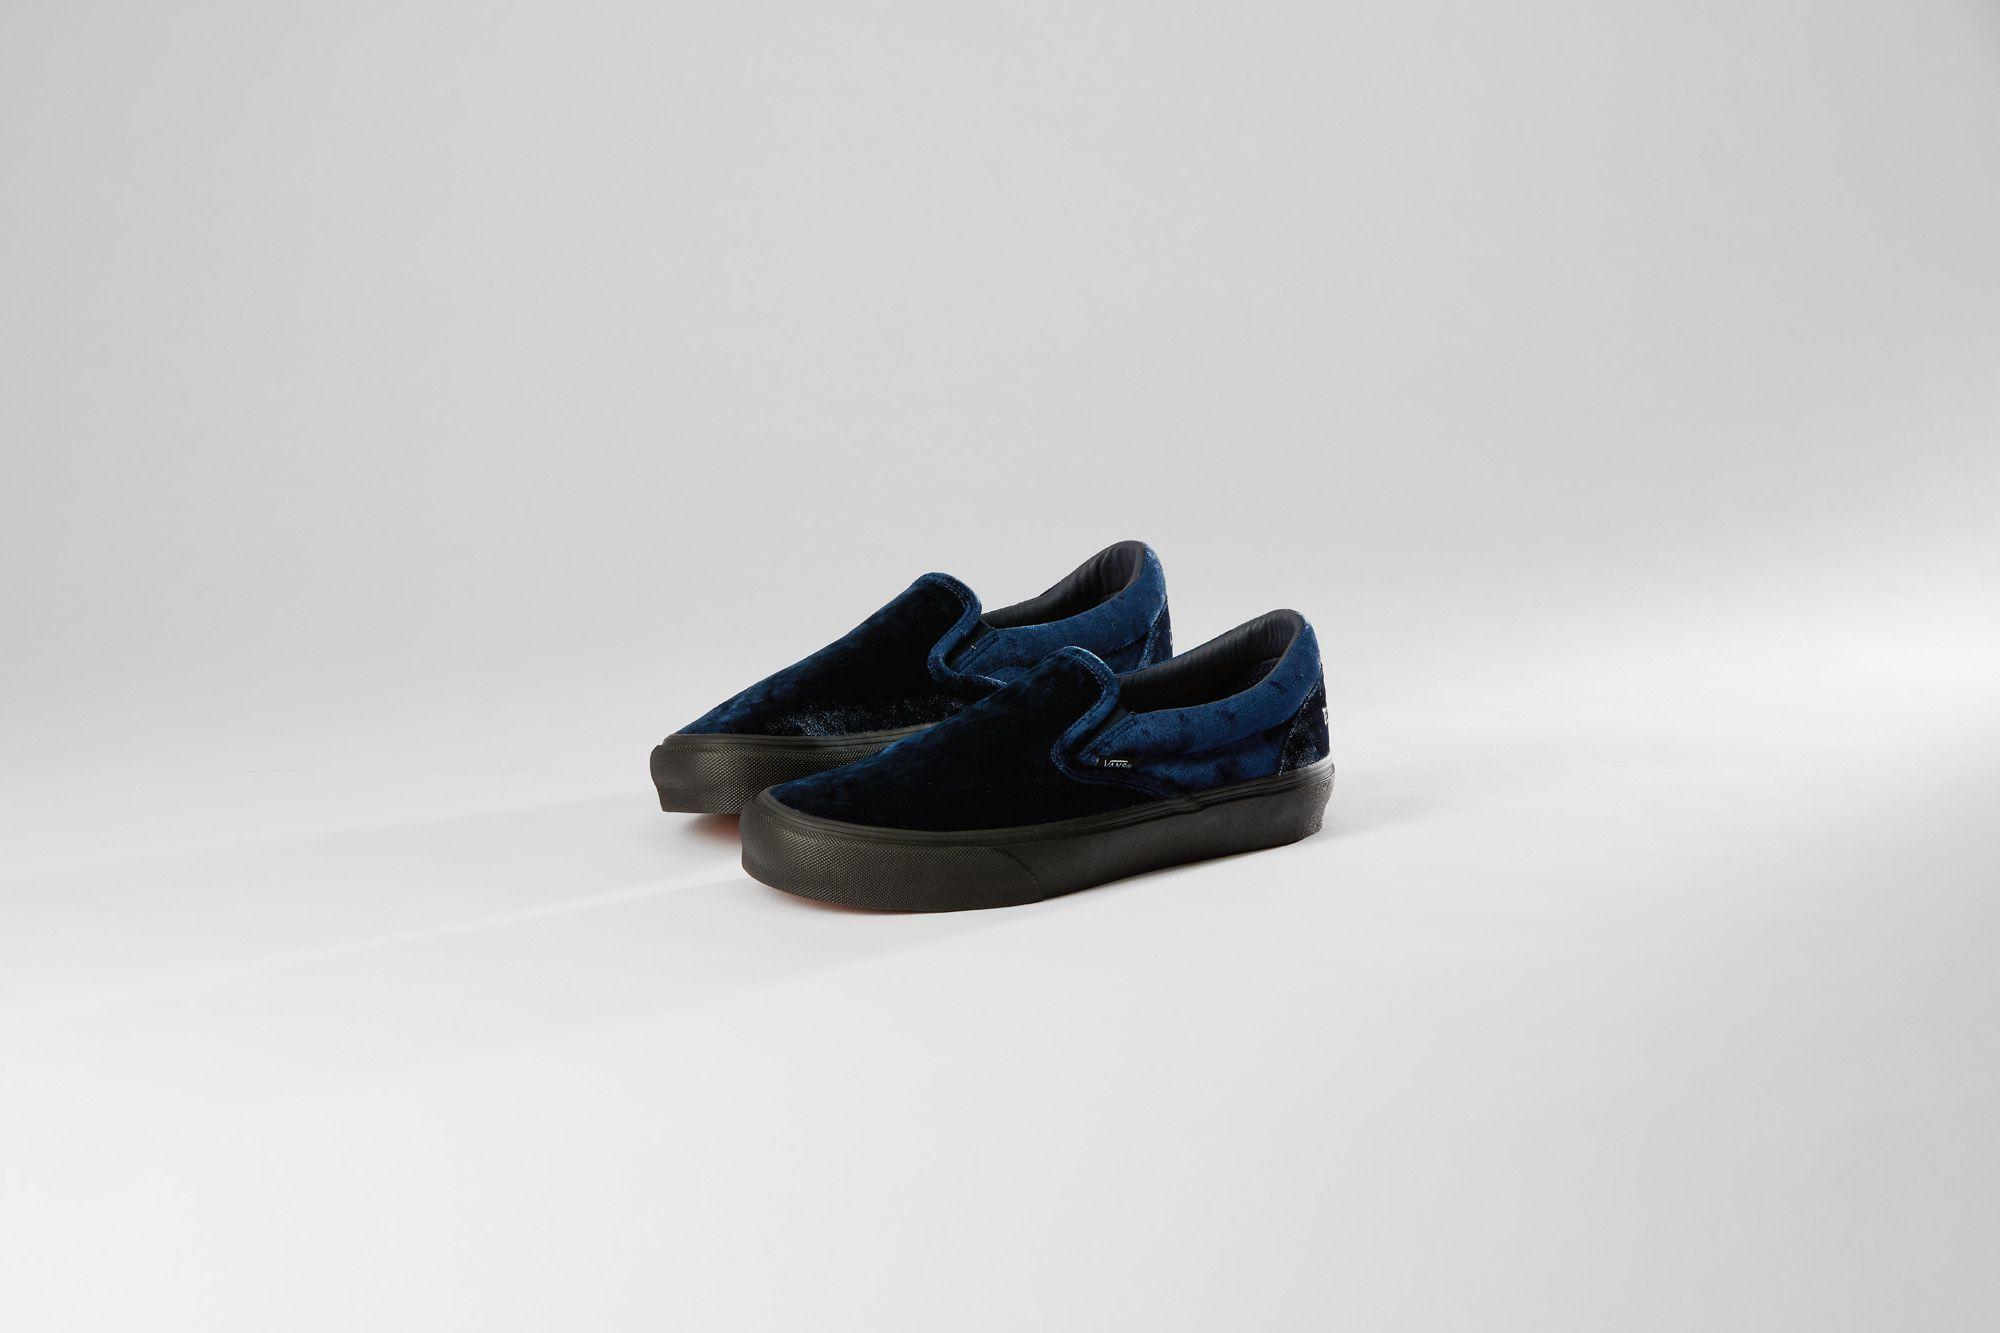 Vans Vault x Noon Goons - Classic Slip-On - black/velvet - VN0A3QXY5VF1 product shot